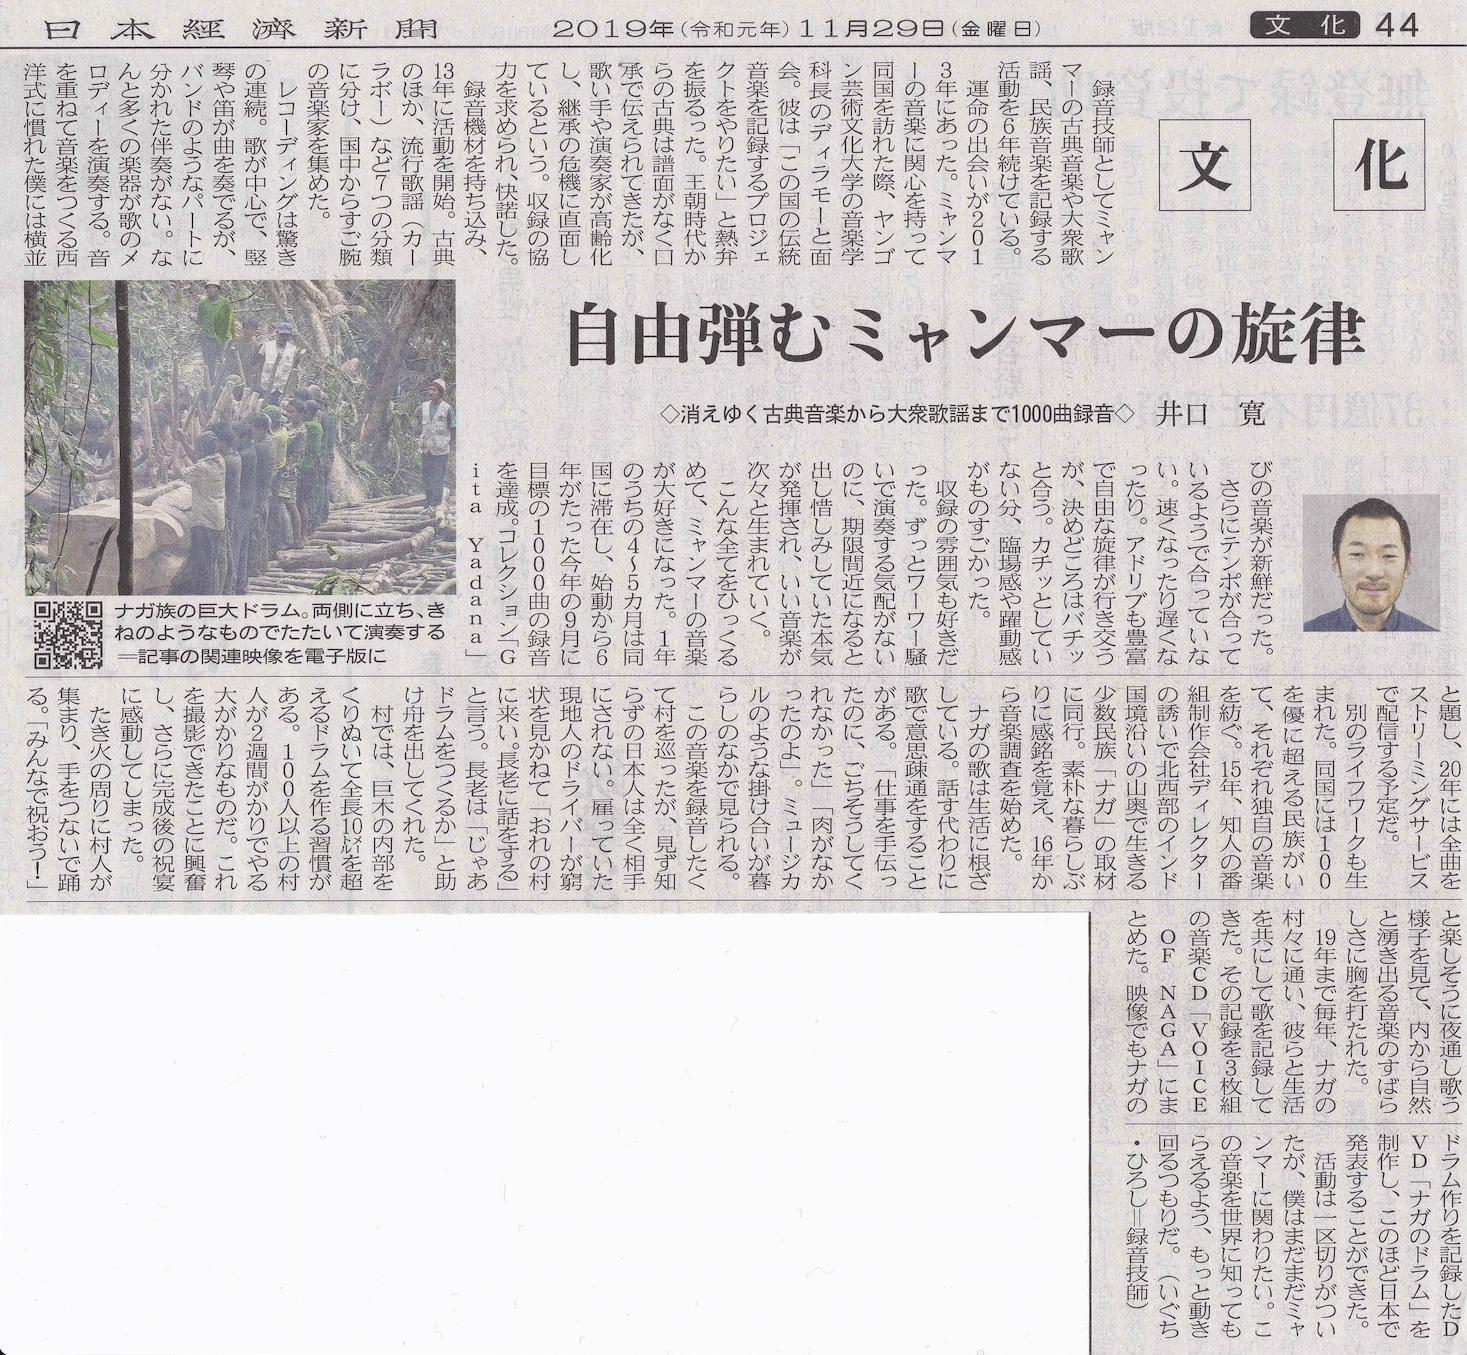 Newspaper|日本経済新聞